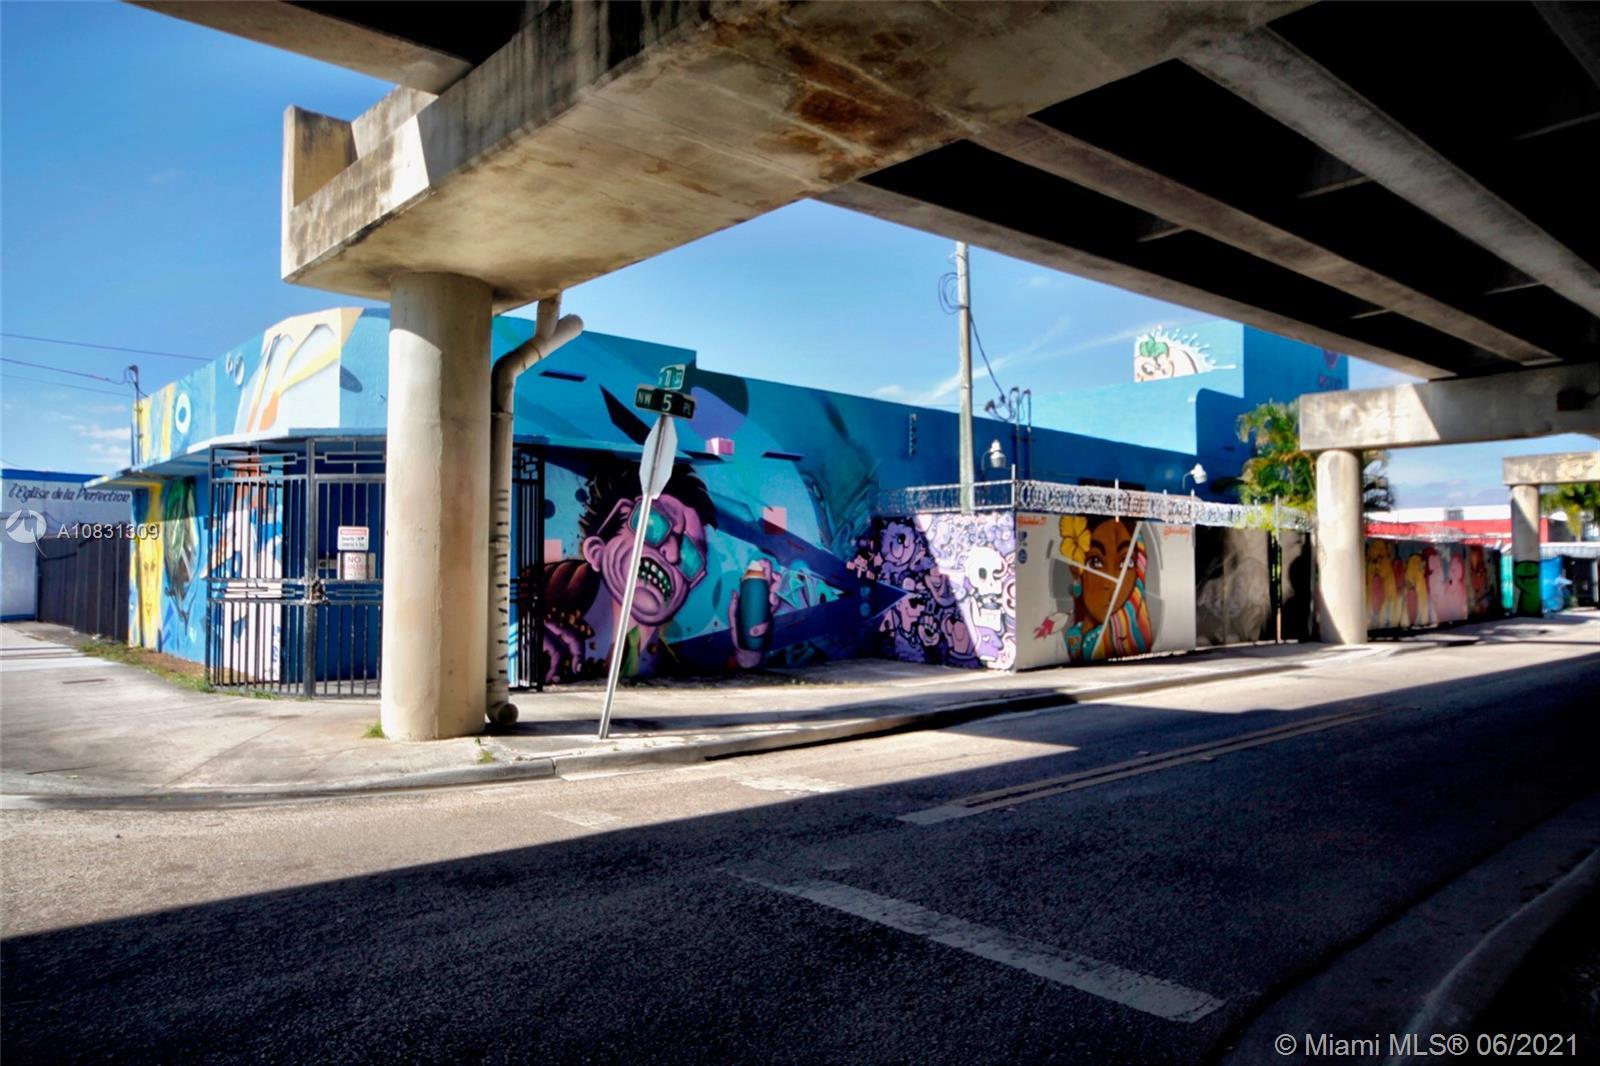 571 NW 71st St, Miami, FL 33150